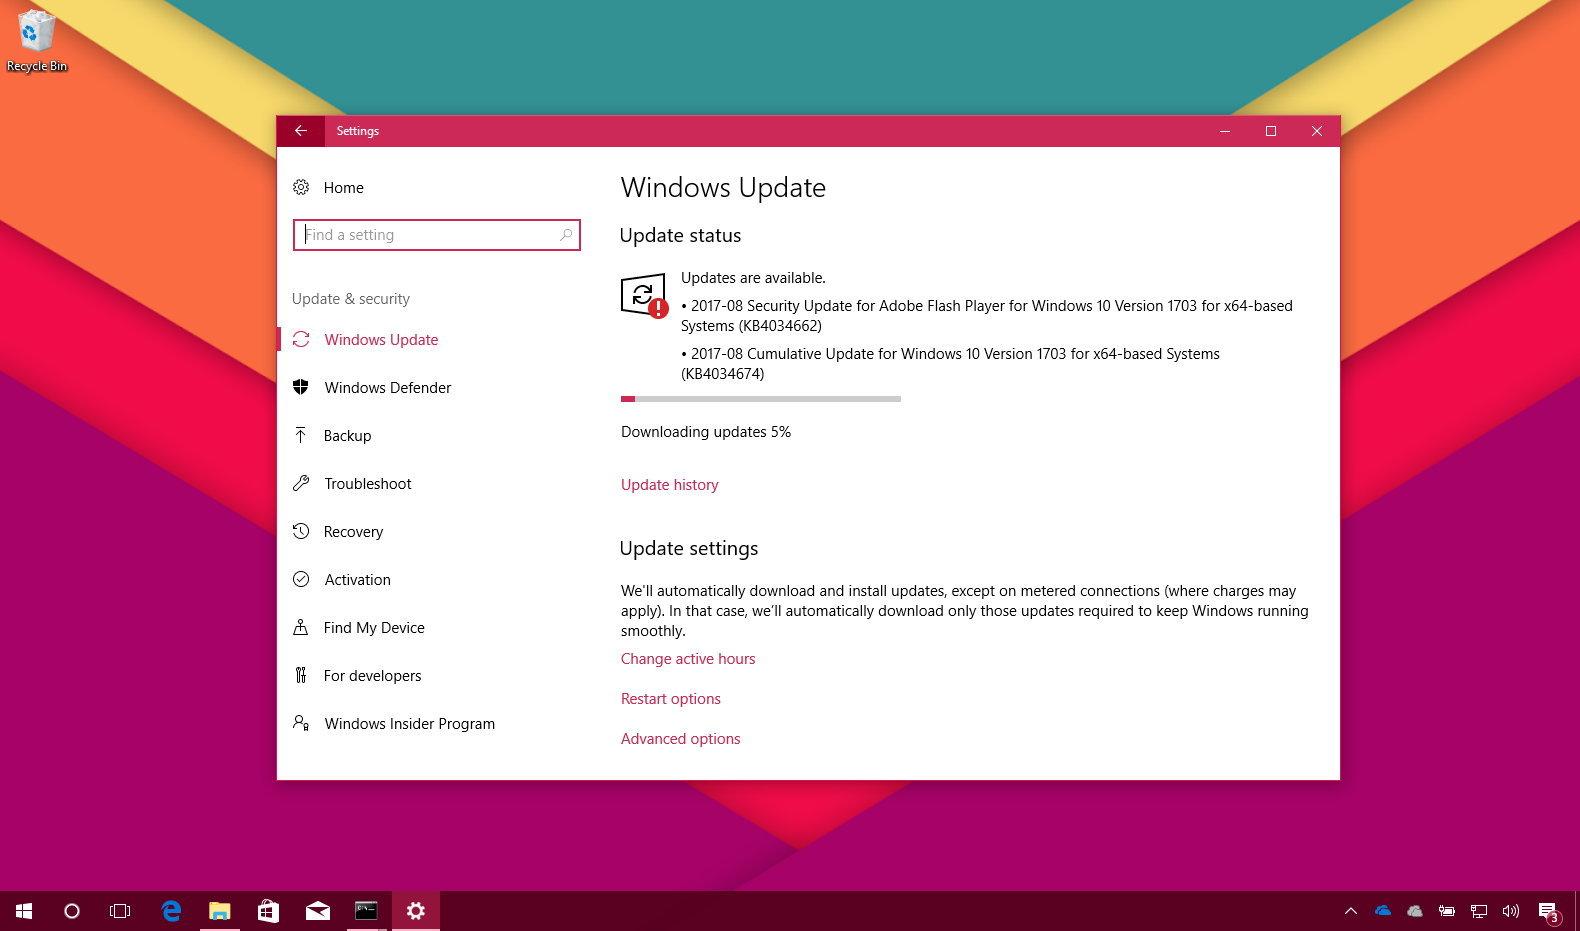 KB4034674 Windows 10 Update